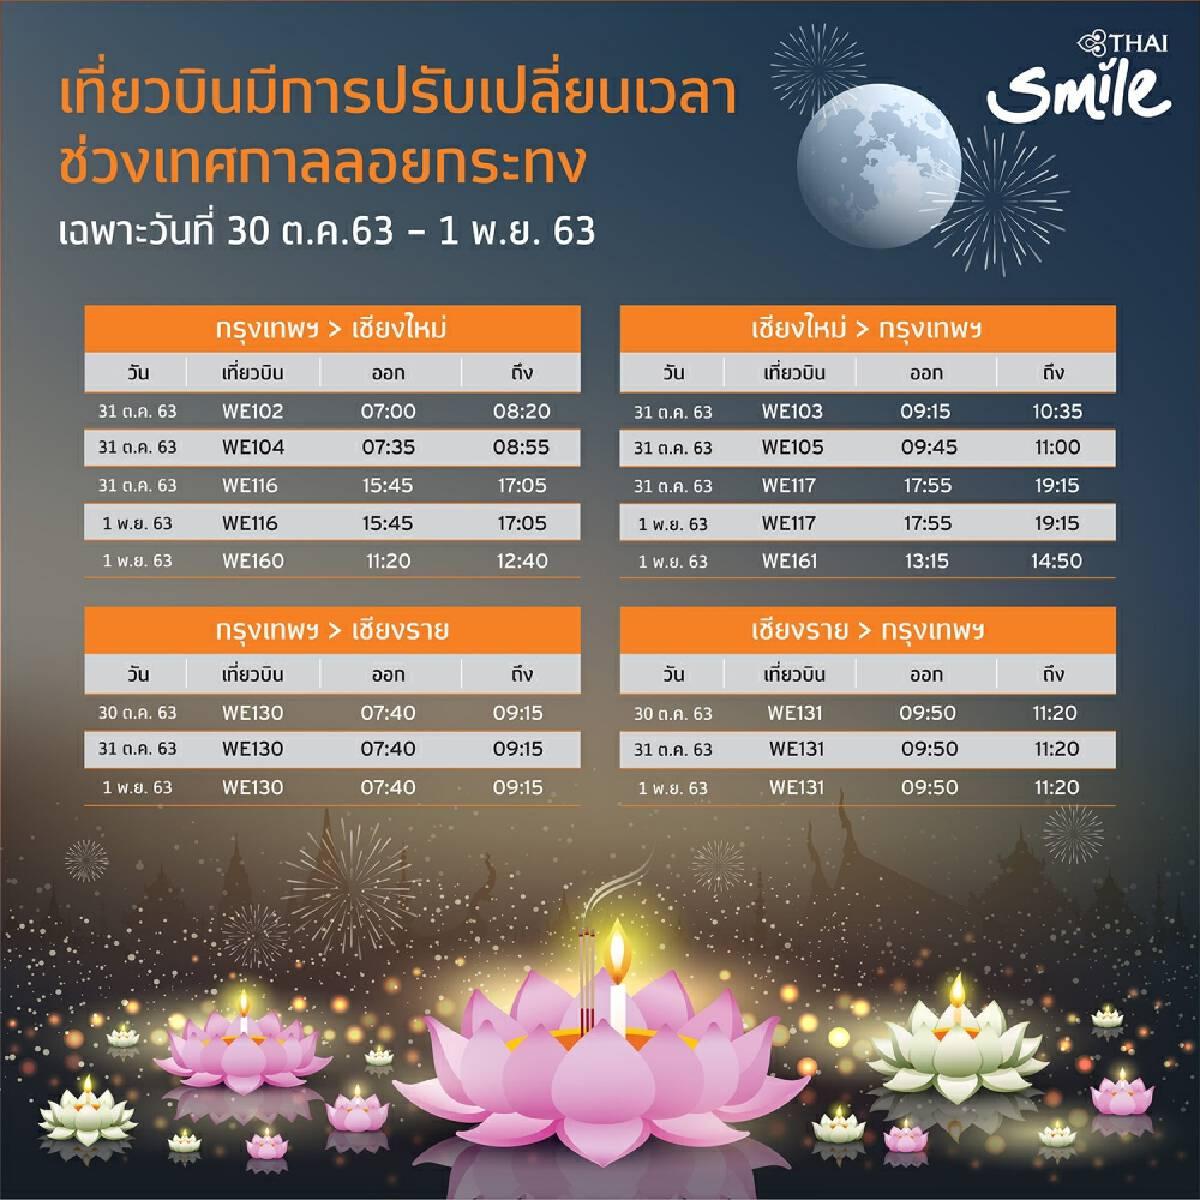 THAI Smile adjusts flights to avoid lanterns